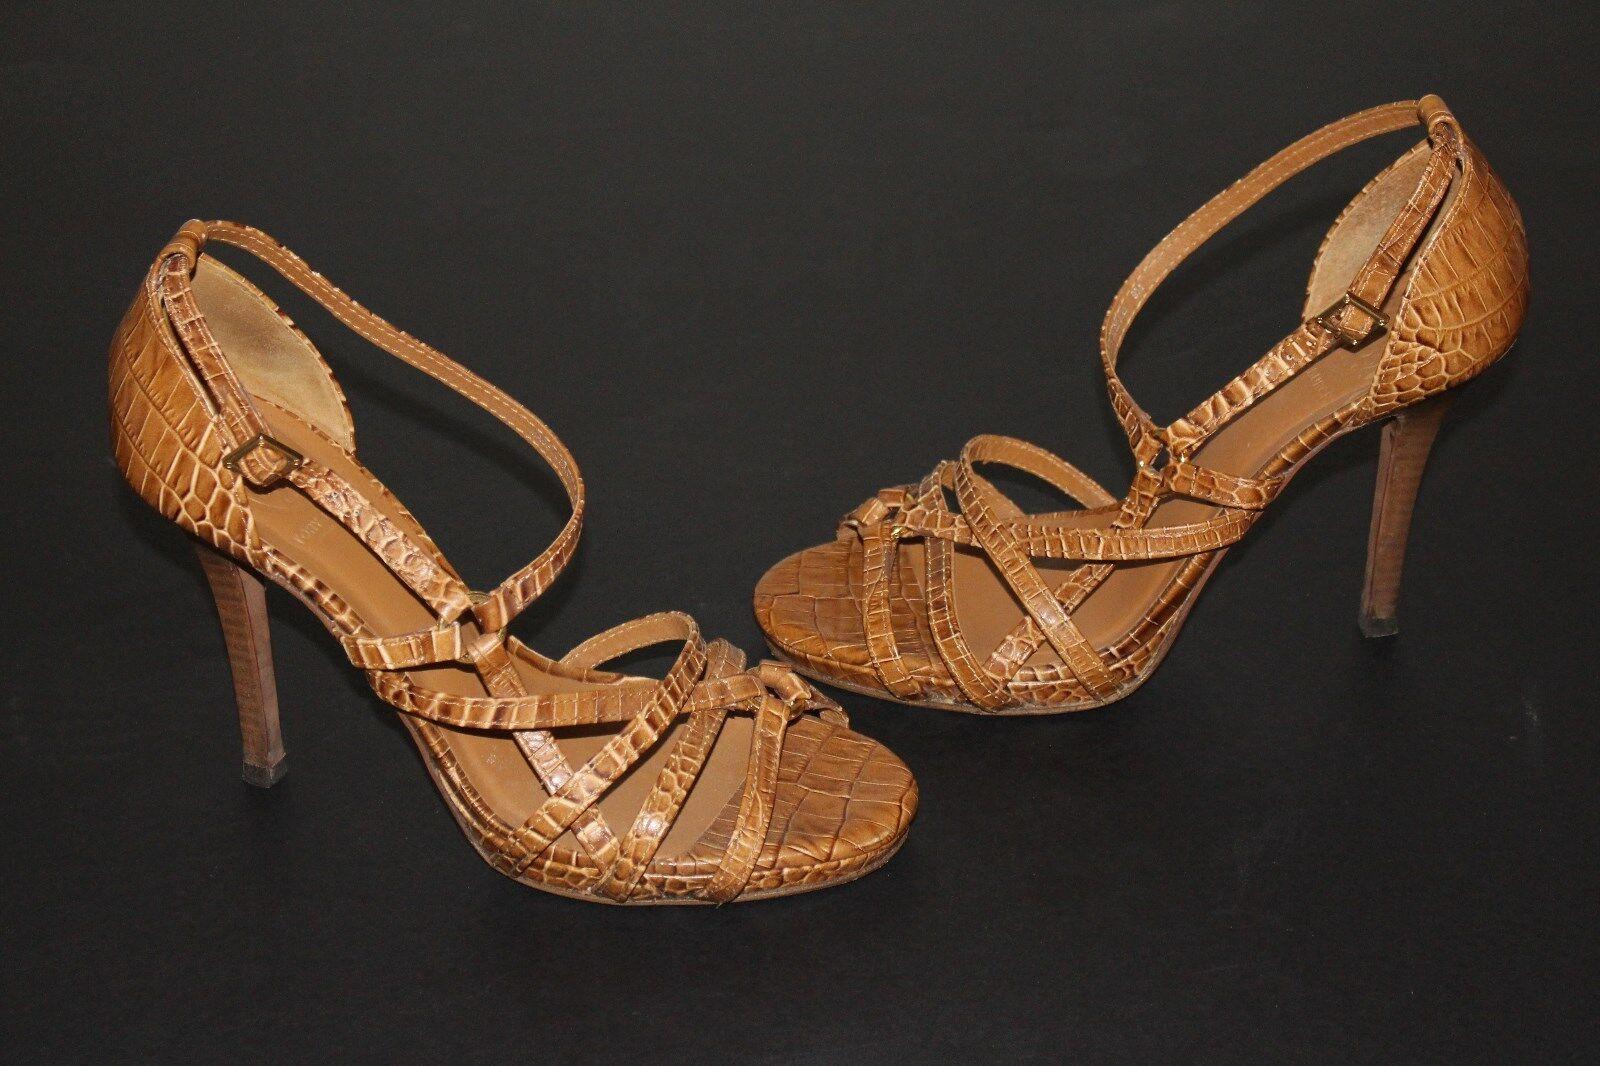 Tory Burch 9 M Tan Croc Embossed Leather Sandal 4.25  Heel Ankle Strap Platform